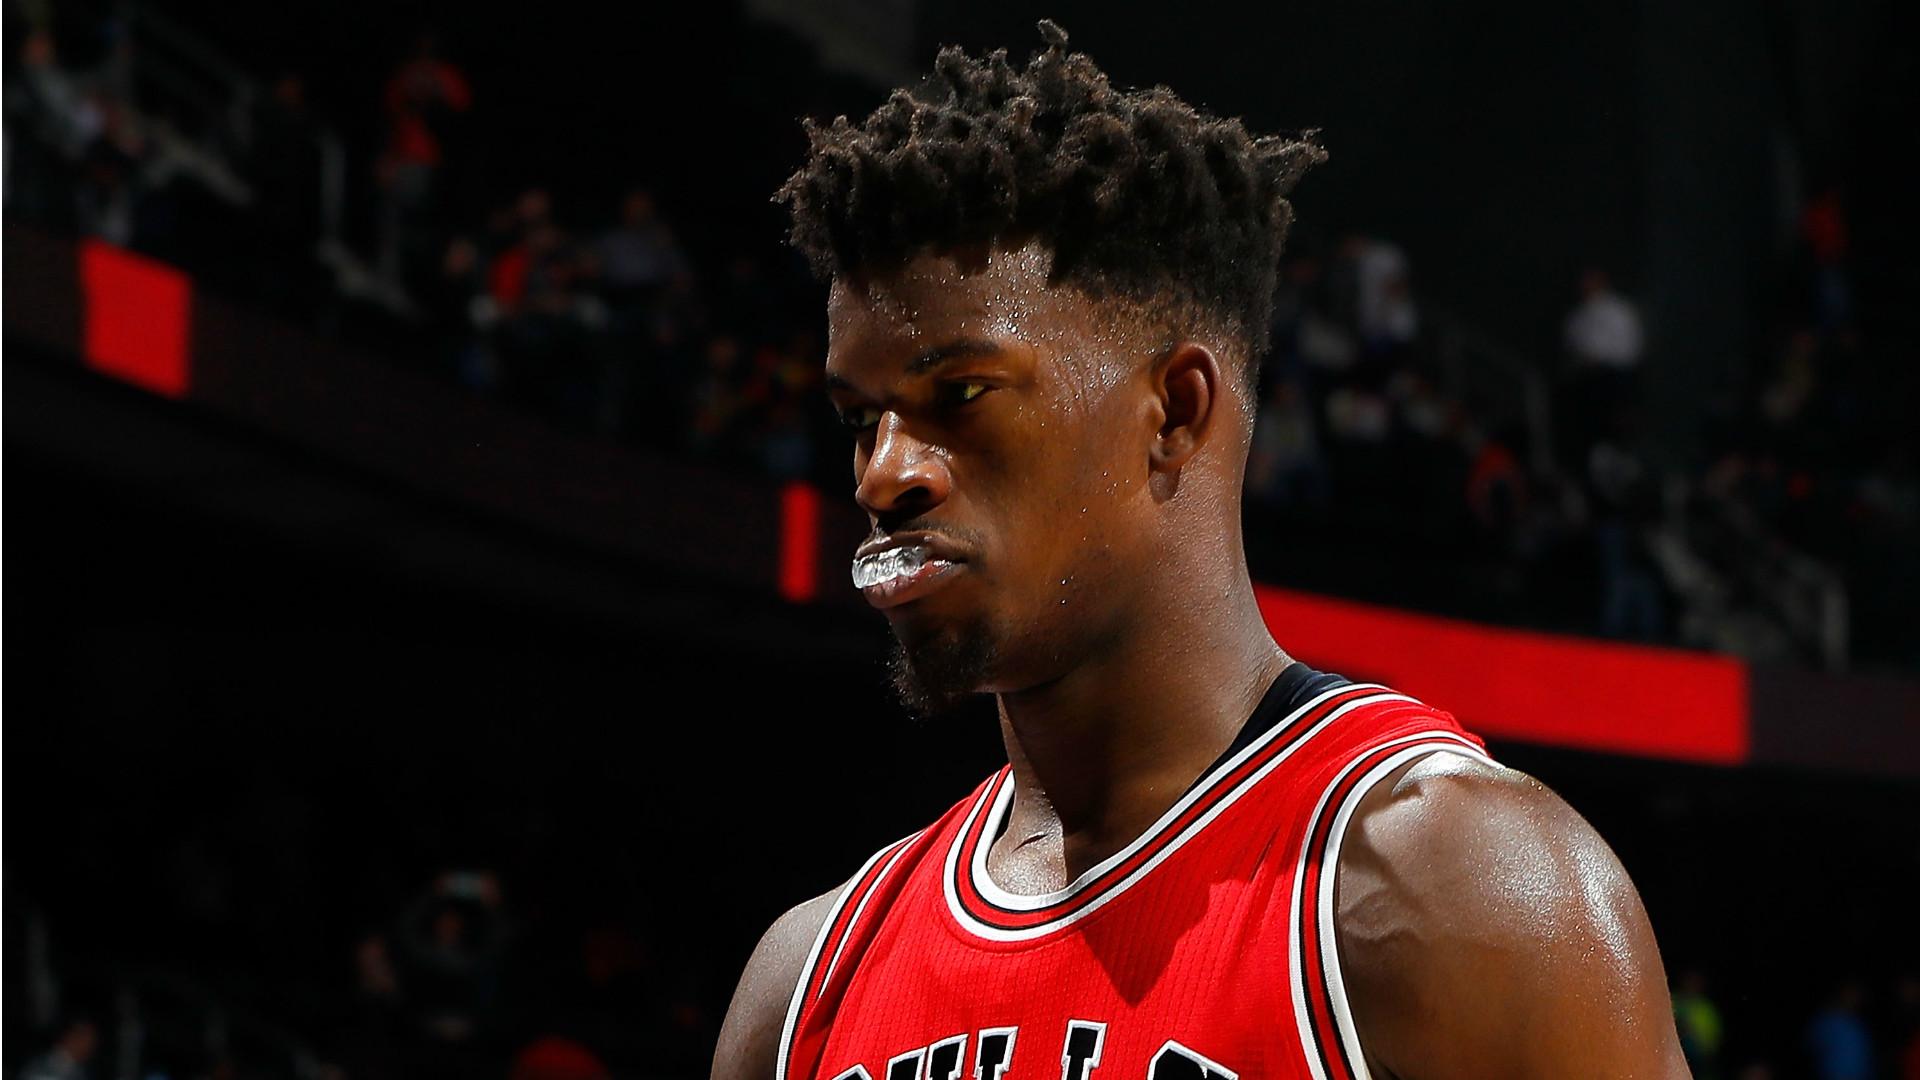 Jimmy Butler rips Bulls' effort after loss to Hawks | NBA | Sporting News